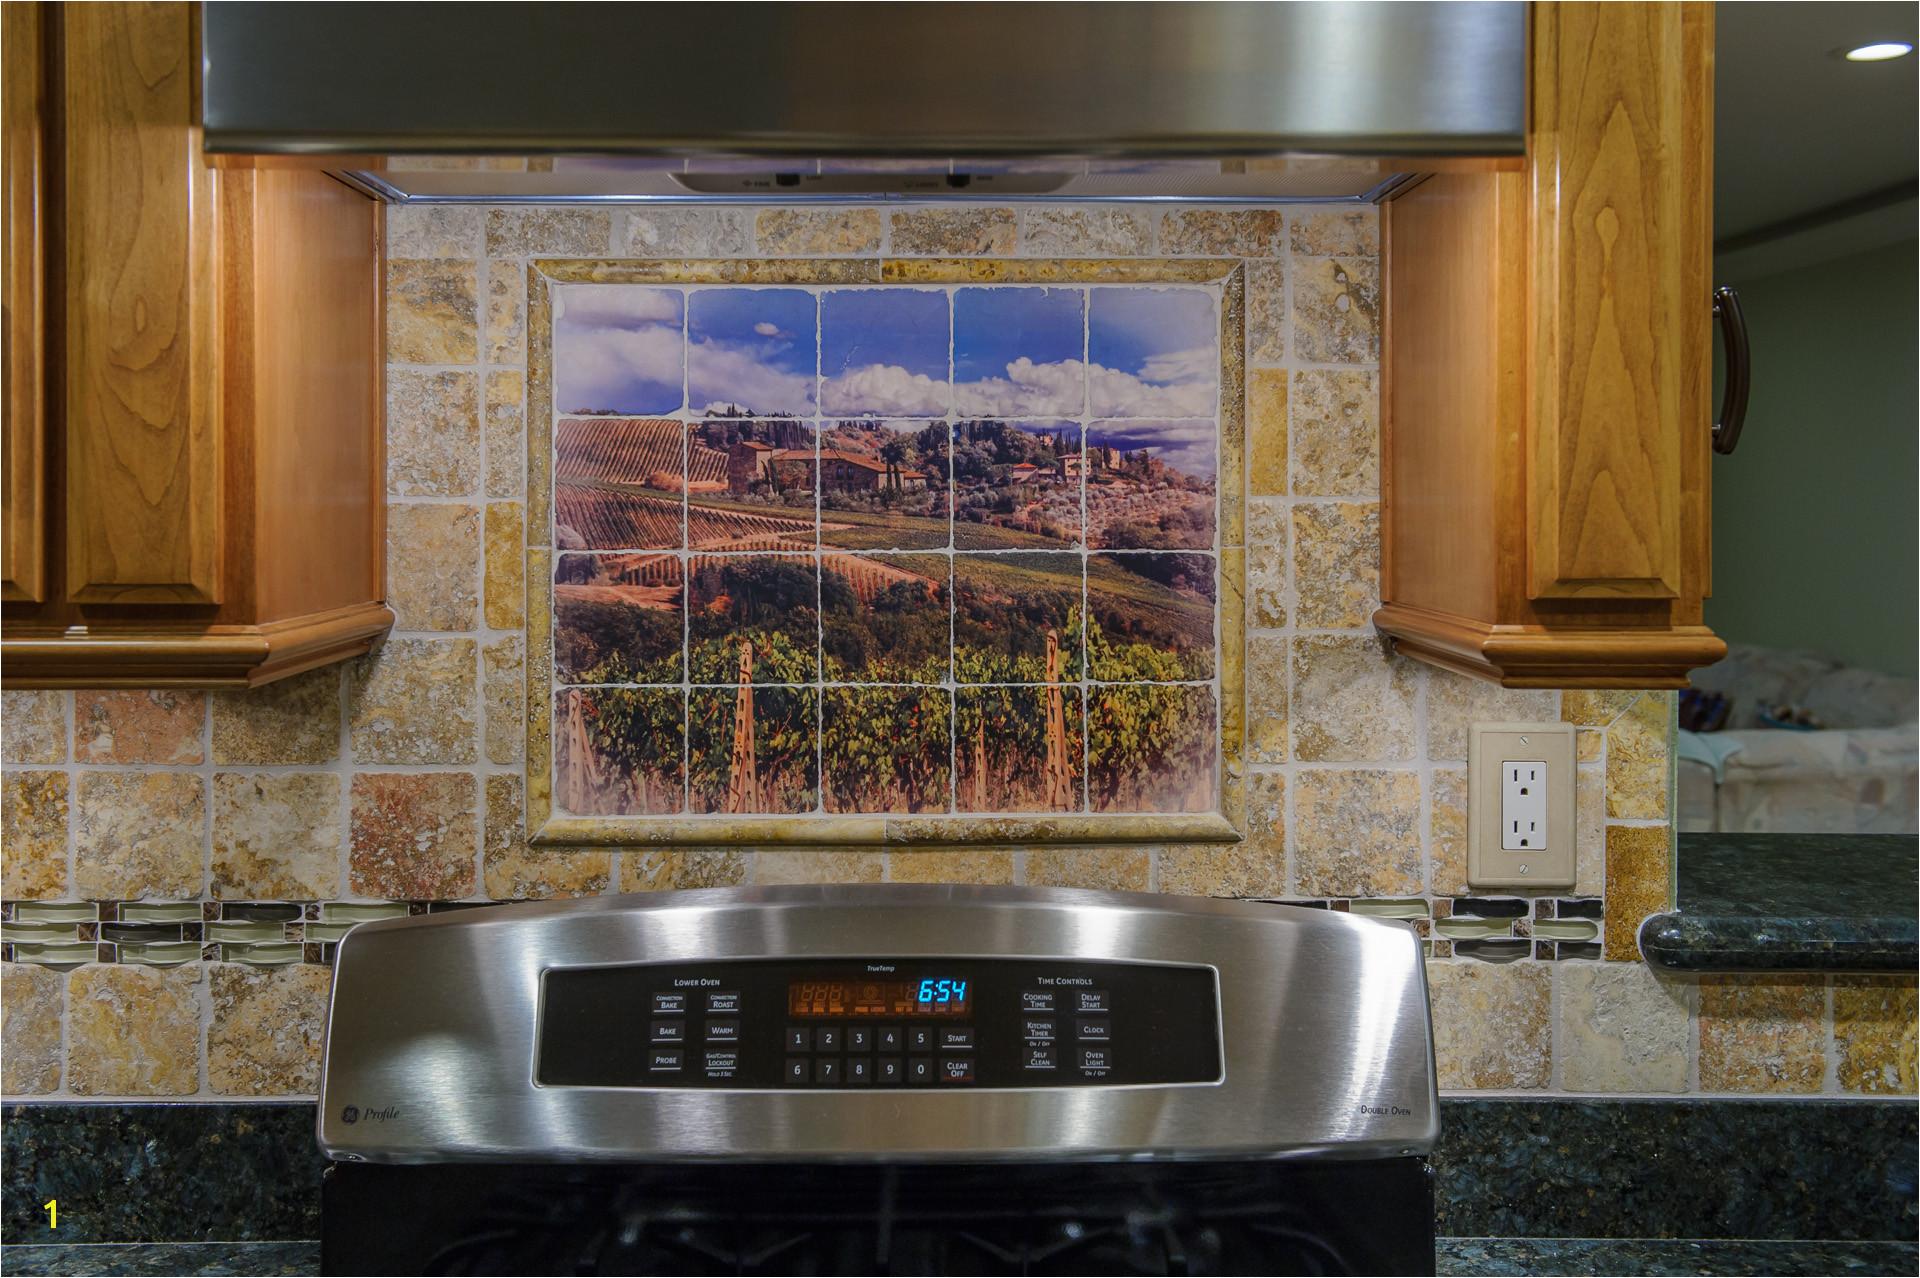 kitchen backsplash Stove Backsplash Tile Murals Modern Kitchen Backsplash Stove Backsplash Tile Murals Modern